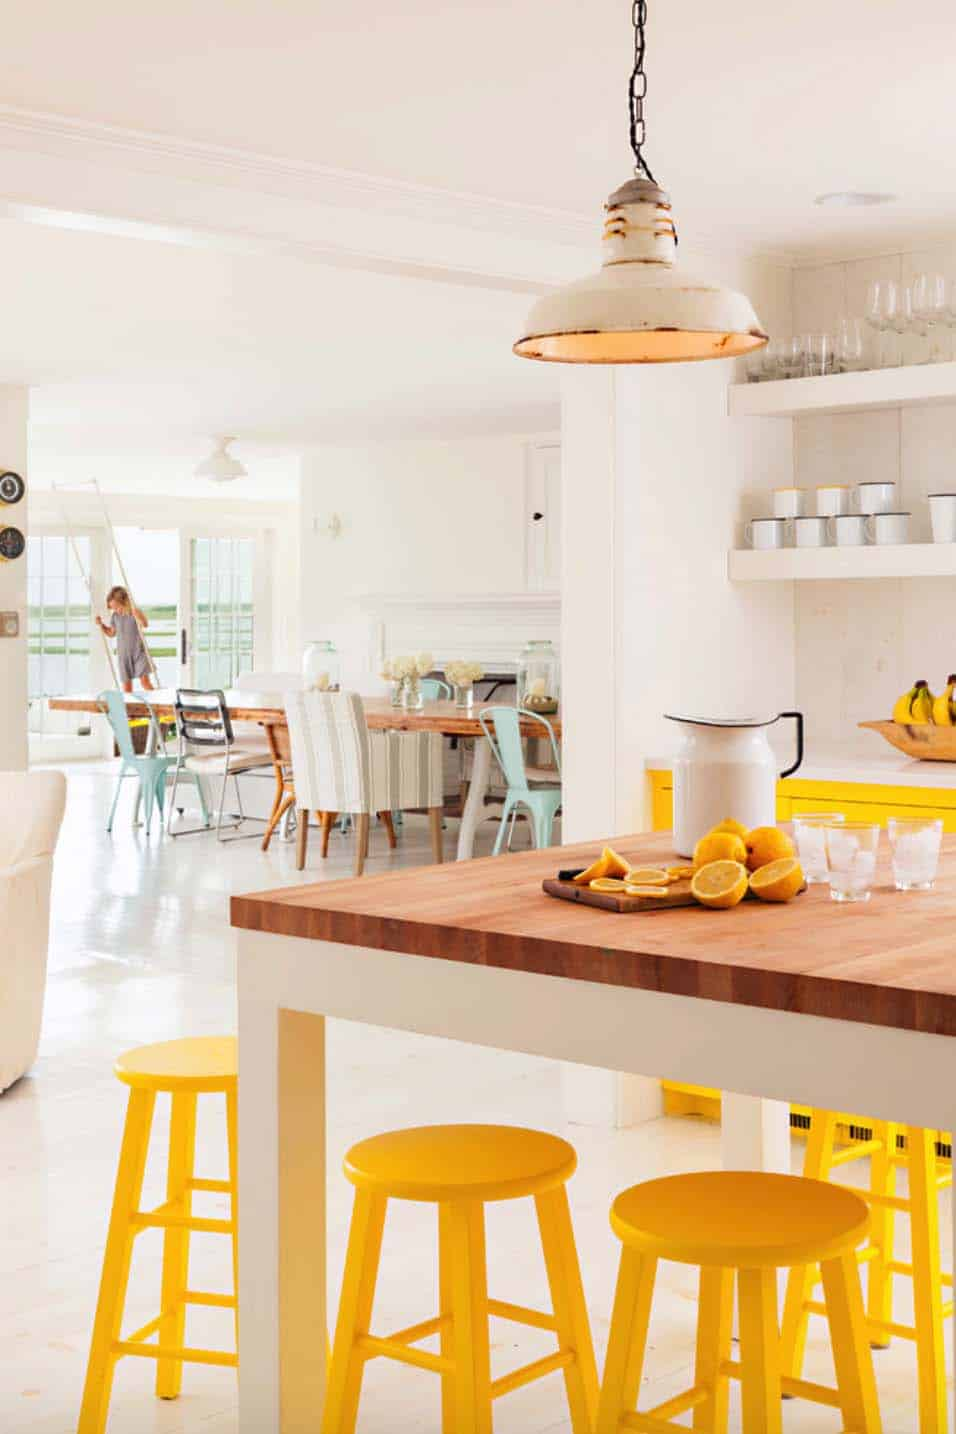 Cape Cod-Style Cottage Interiors-17-1 Kindesign